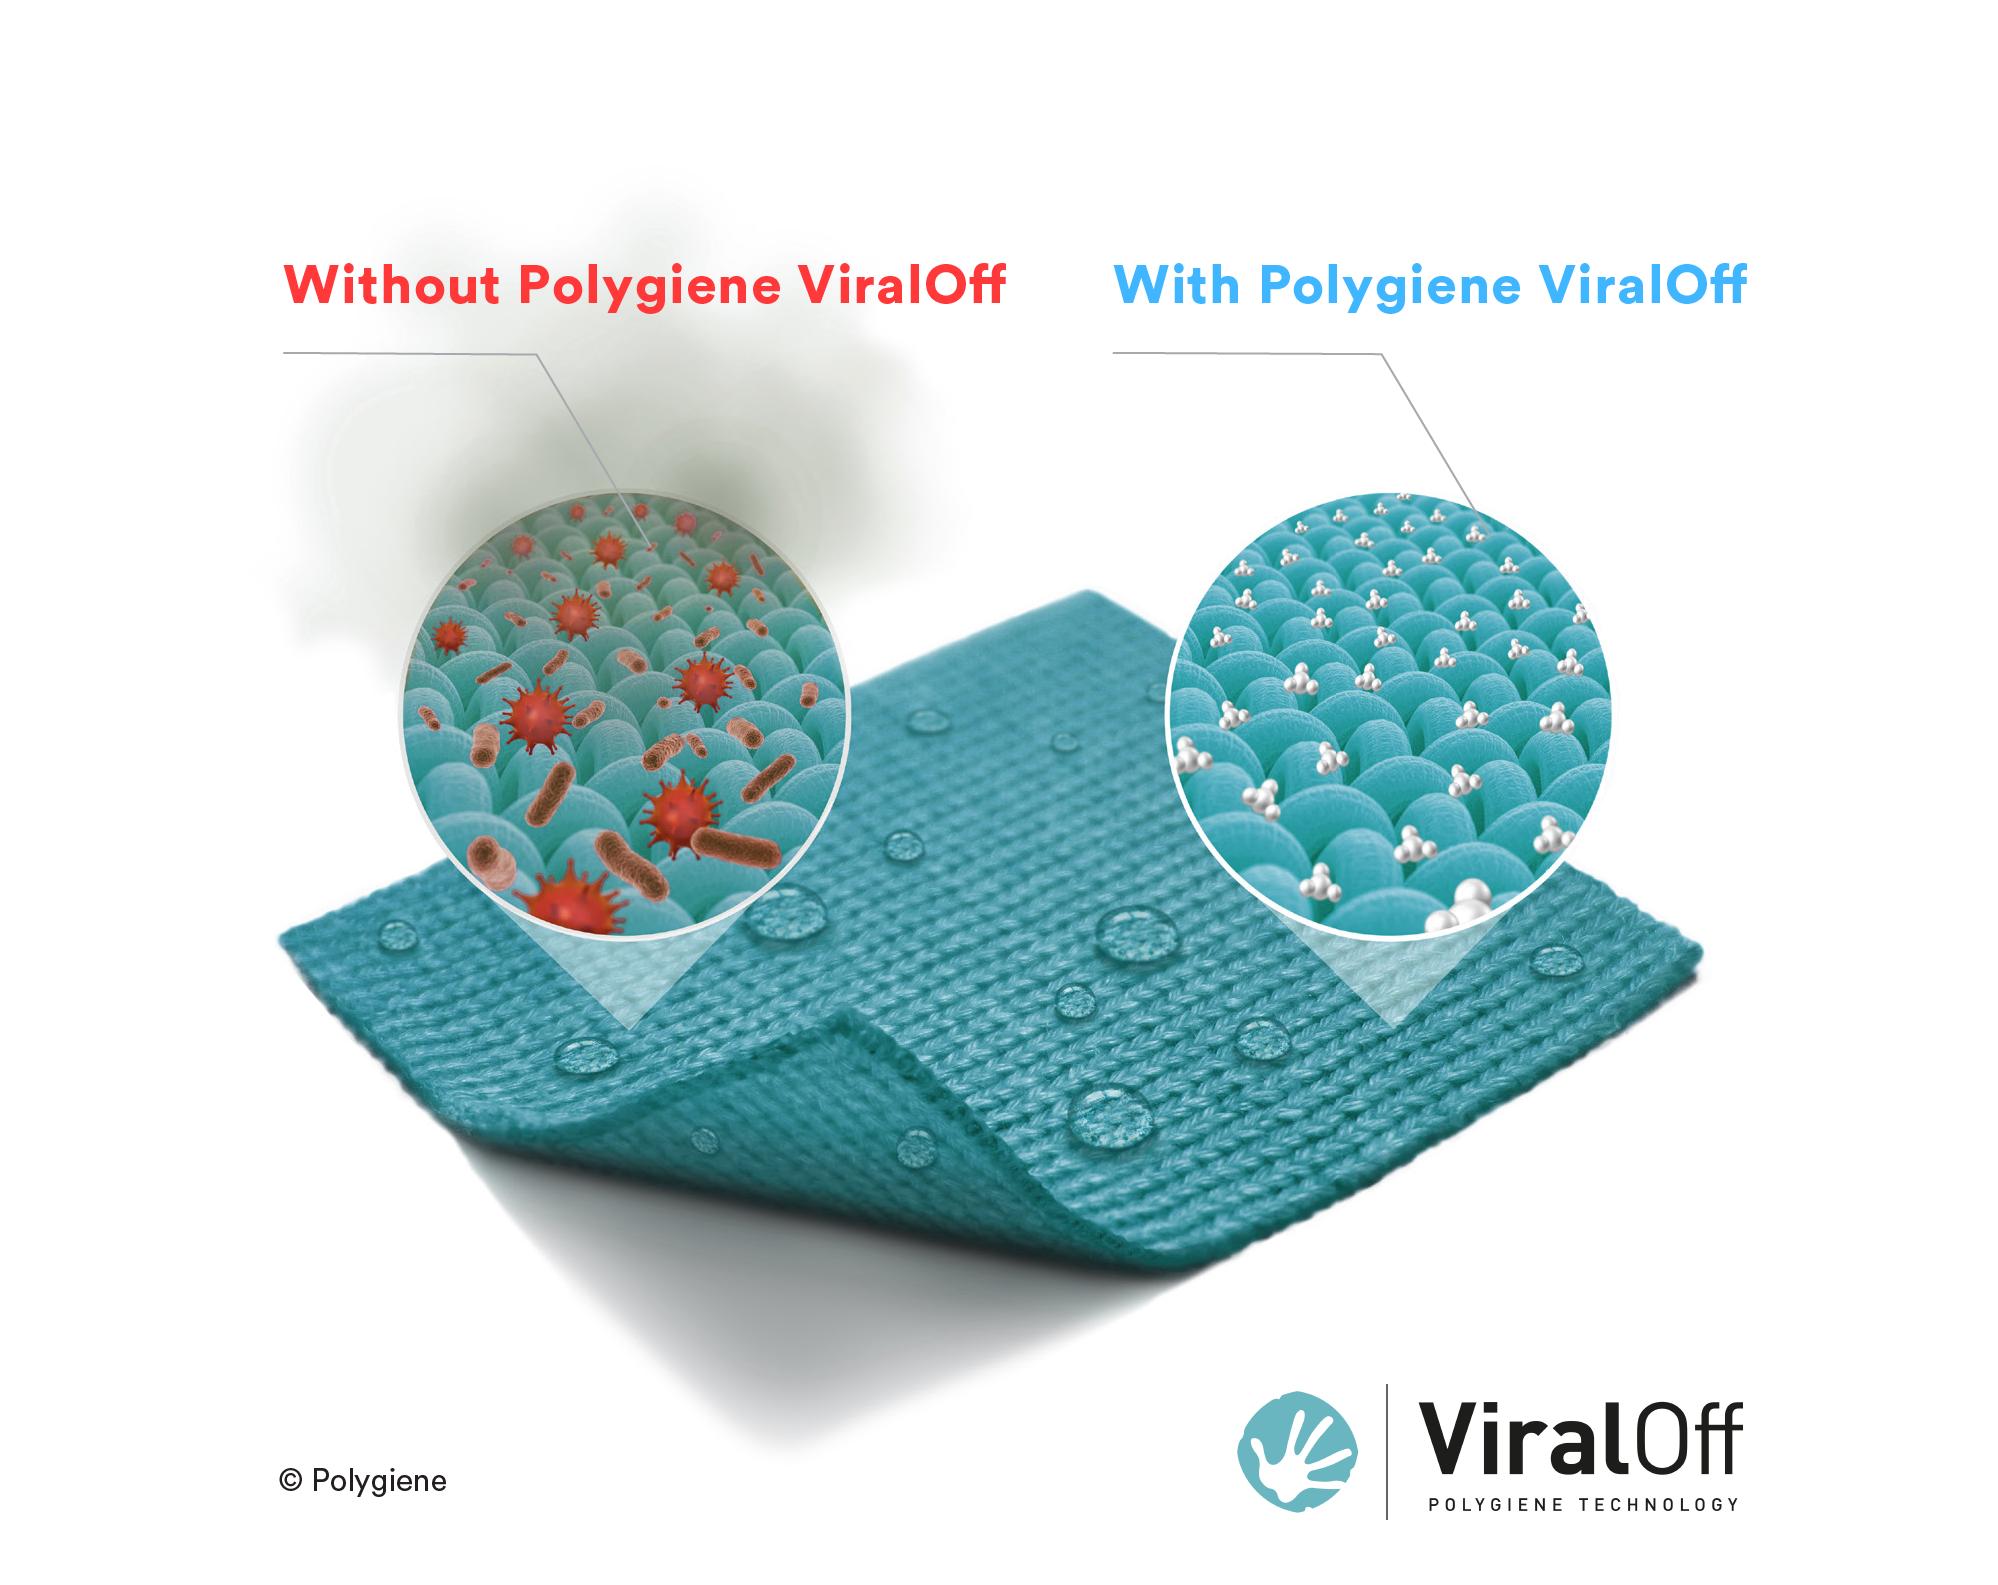 2-Polygiene_How it works_ViralOff_Logo_3D-Illustration_EN